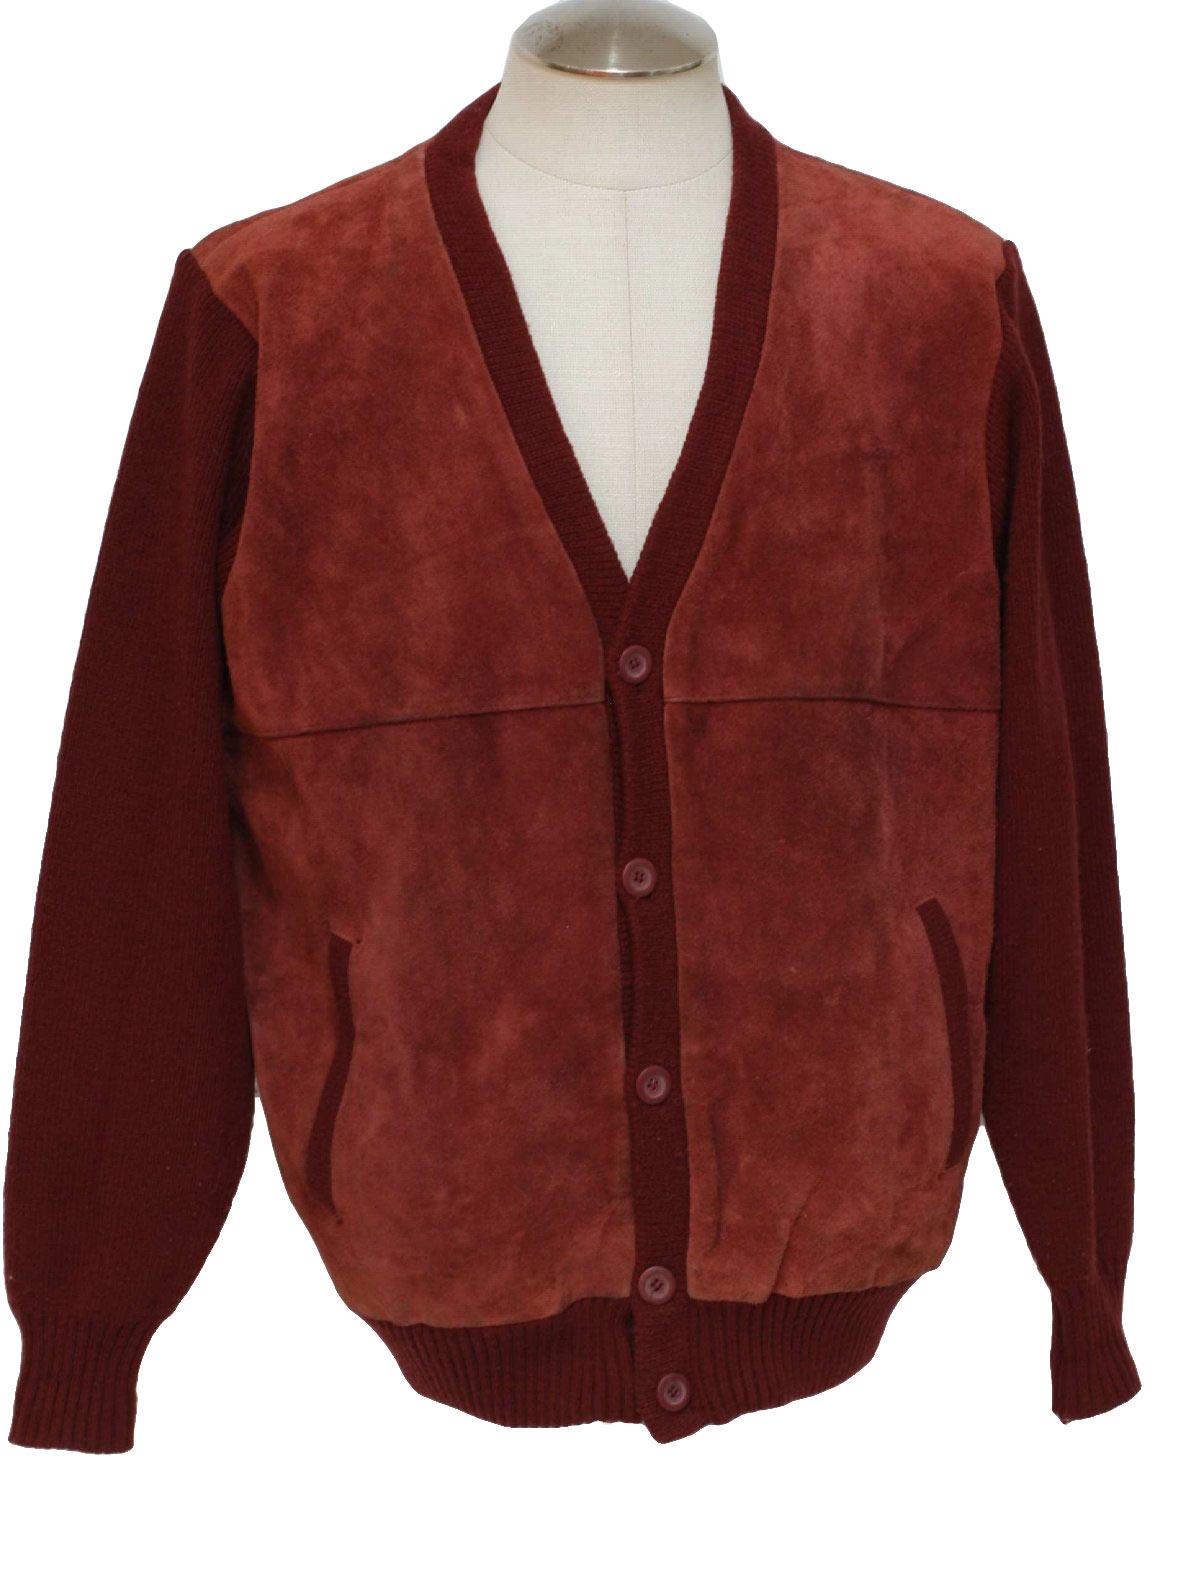 model citizens: Wear vintage leather